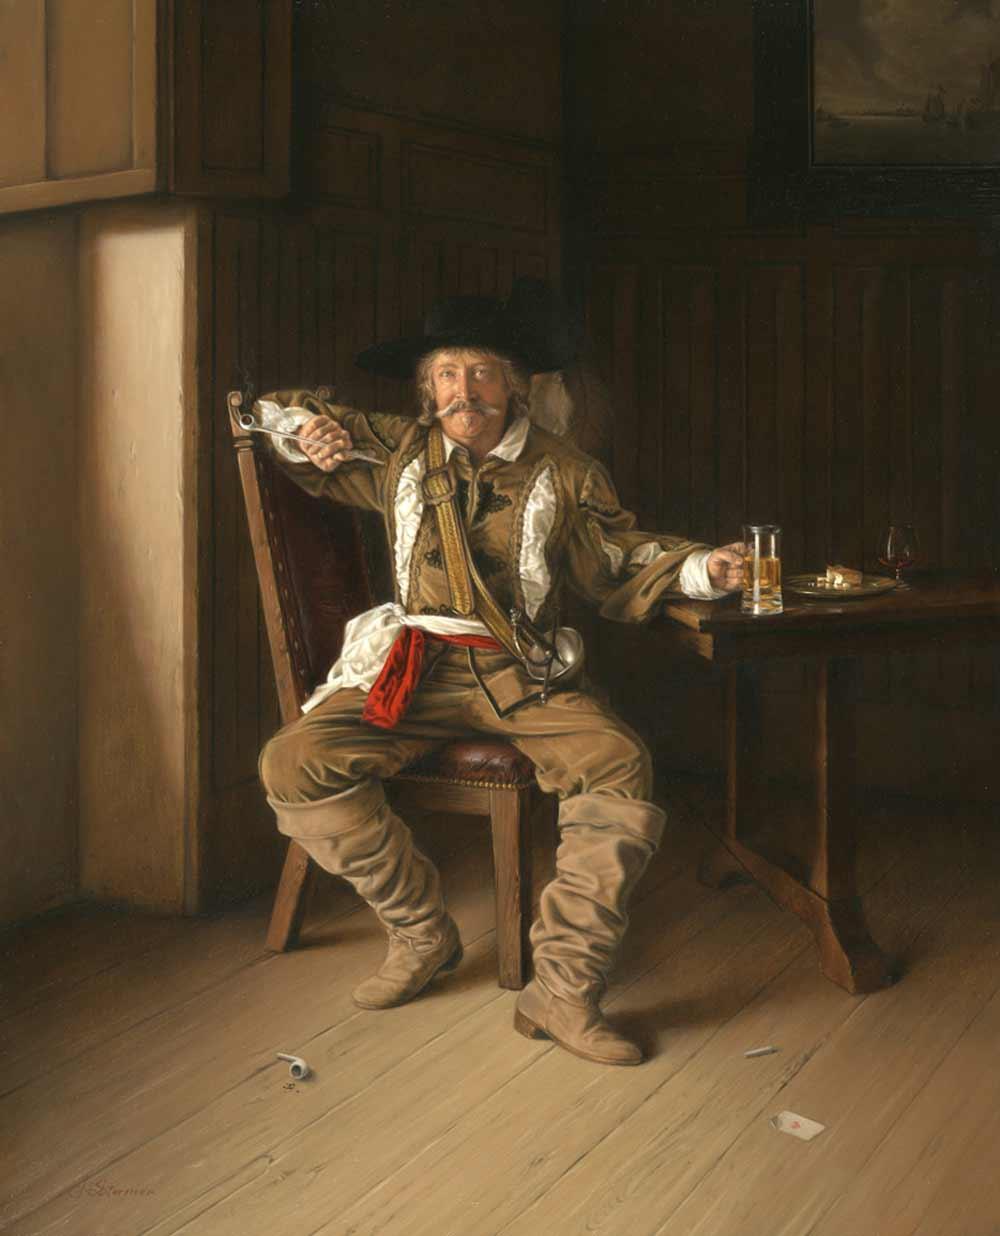 Cavalier Self by Jeremiah Stermer